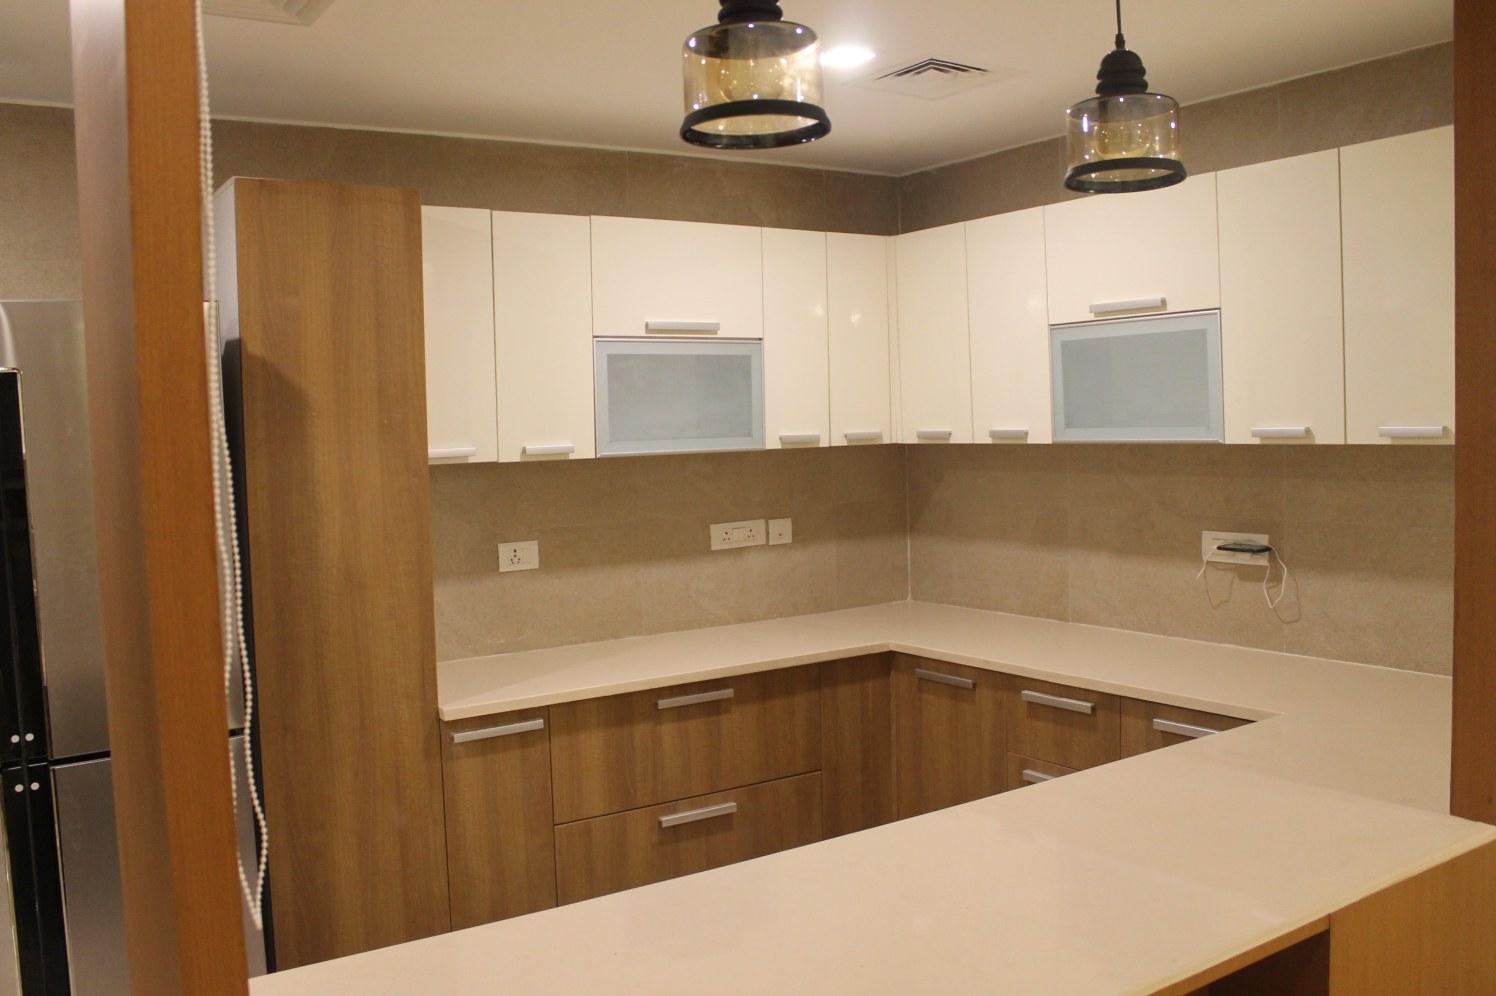 Modular U shaped kitchen by coalitiondesigns Modular-kitchen Modern | Interior Design Photos & Ideas